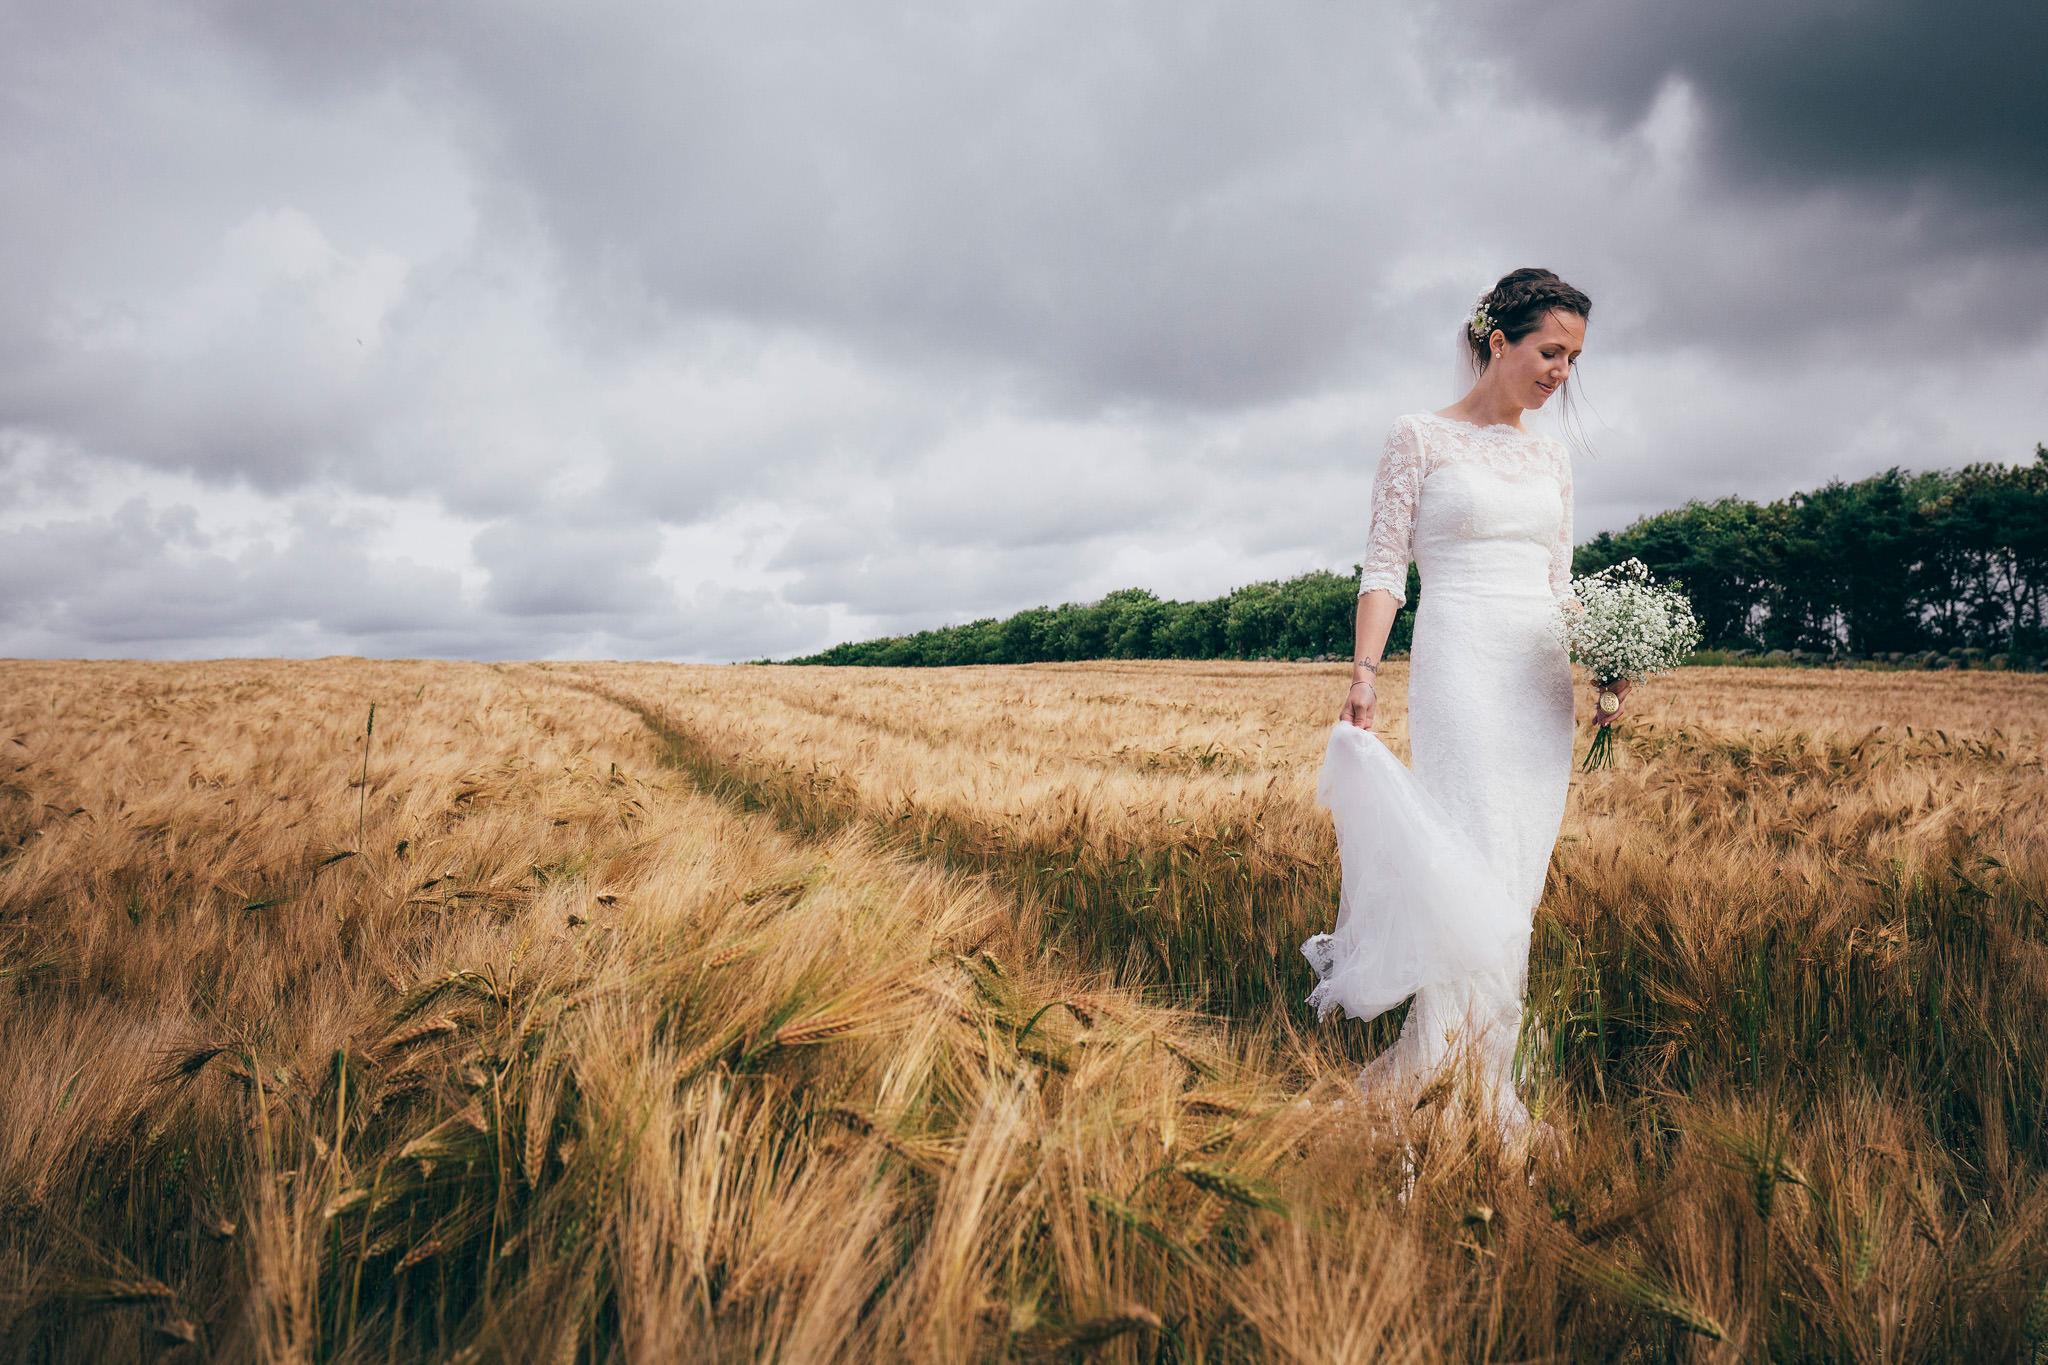 Norway+wedding+photographer+elopement+pre+wedding+Casey+Arneson-81.jpg